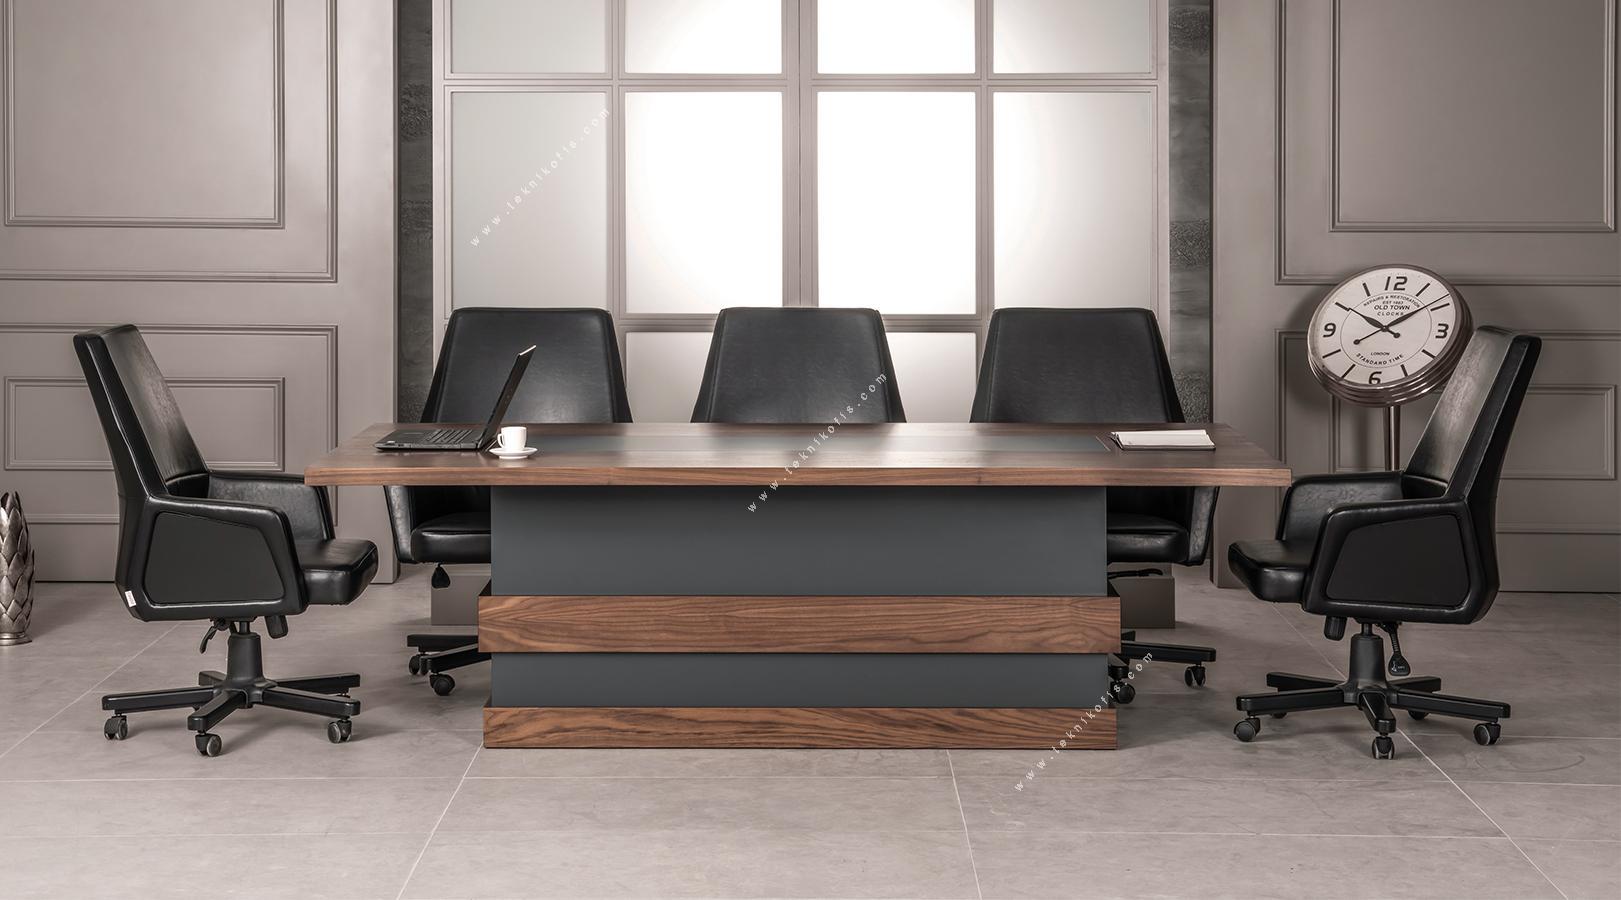 director toplantı masası